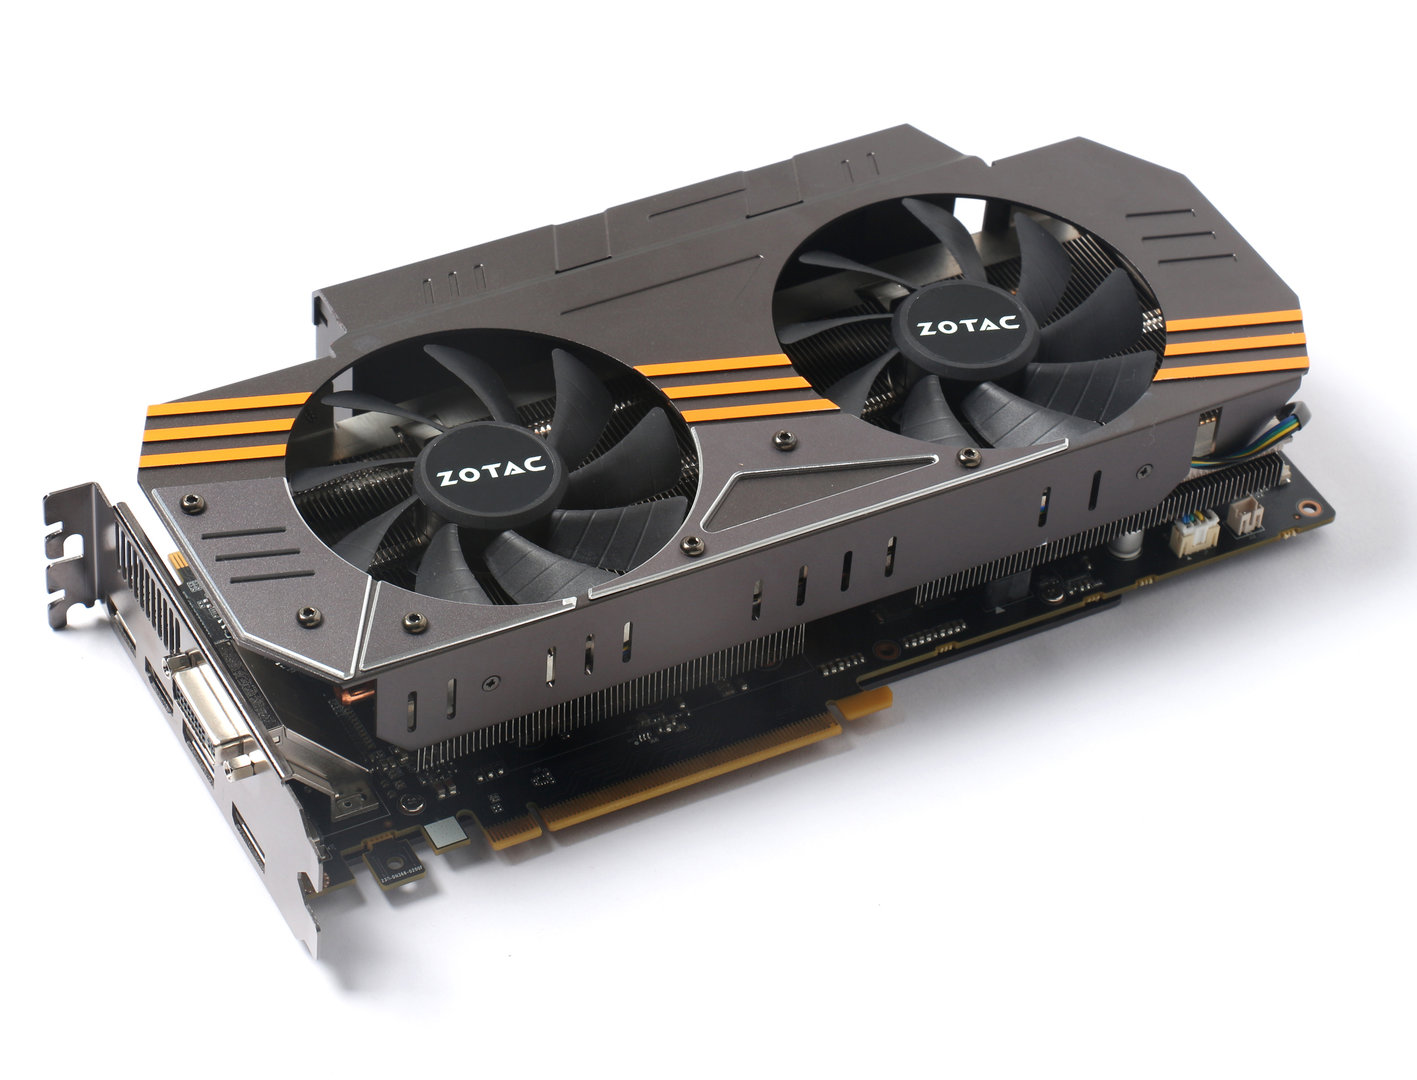 Zotac GeForce GTX 970 AMP! Omega